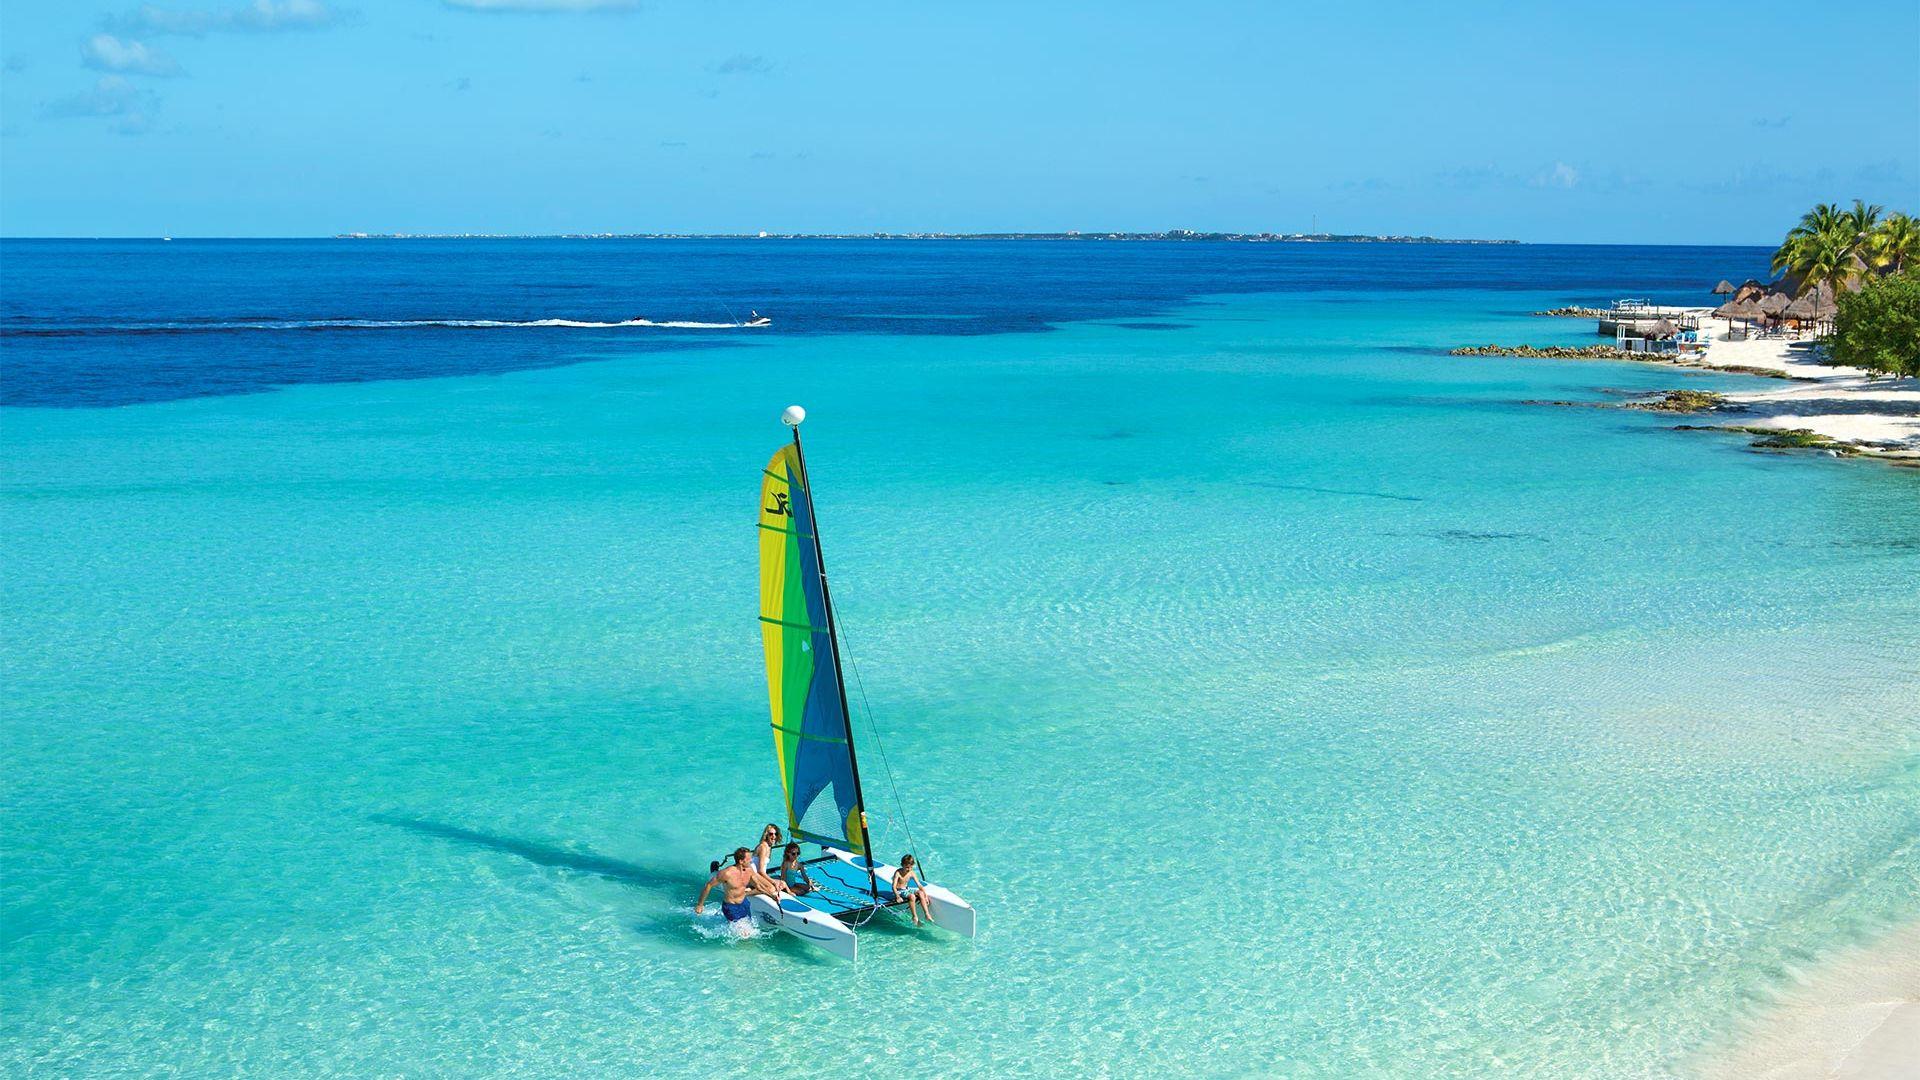 Sejur plaja Riviera Maya, Mexic, 10 zile - februarie 2022